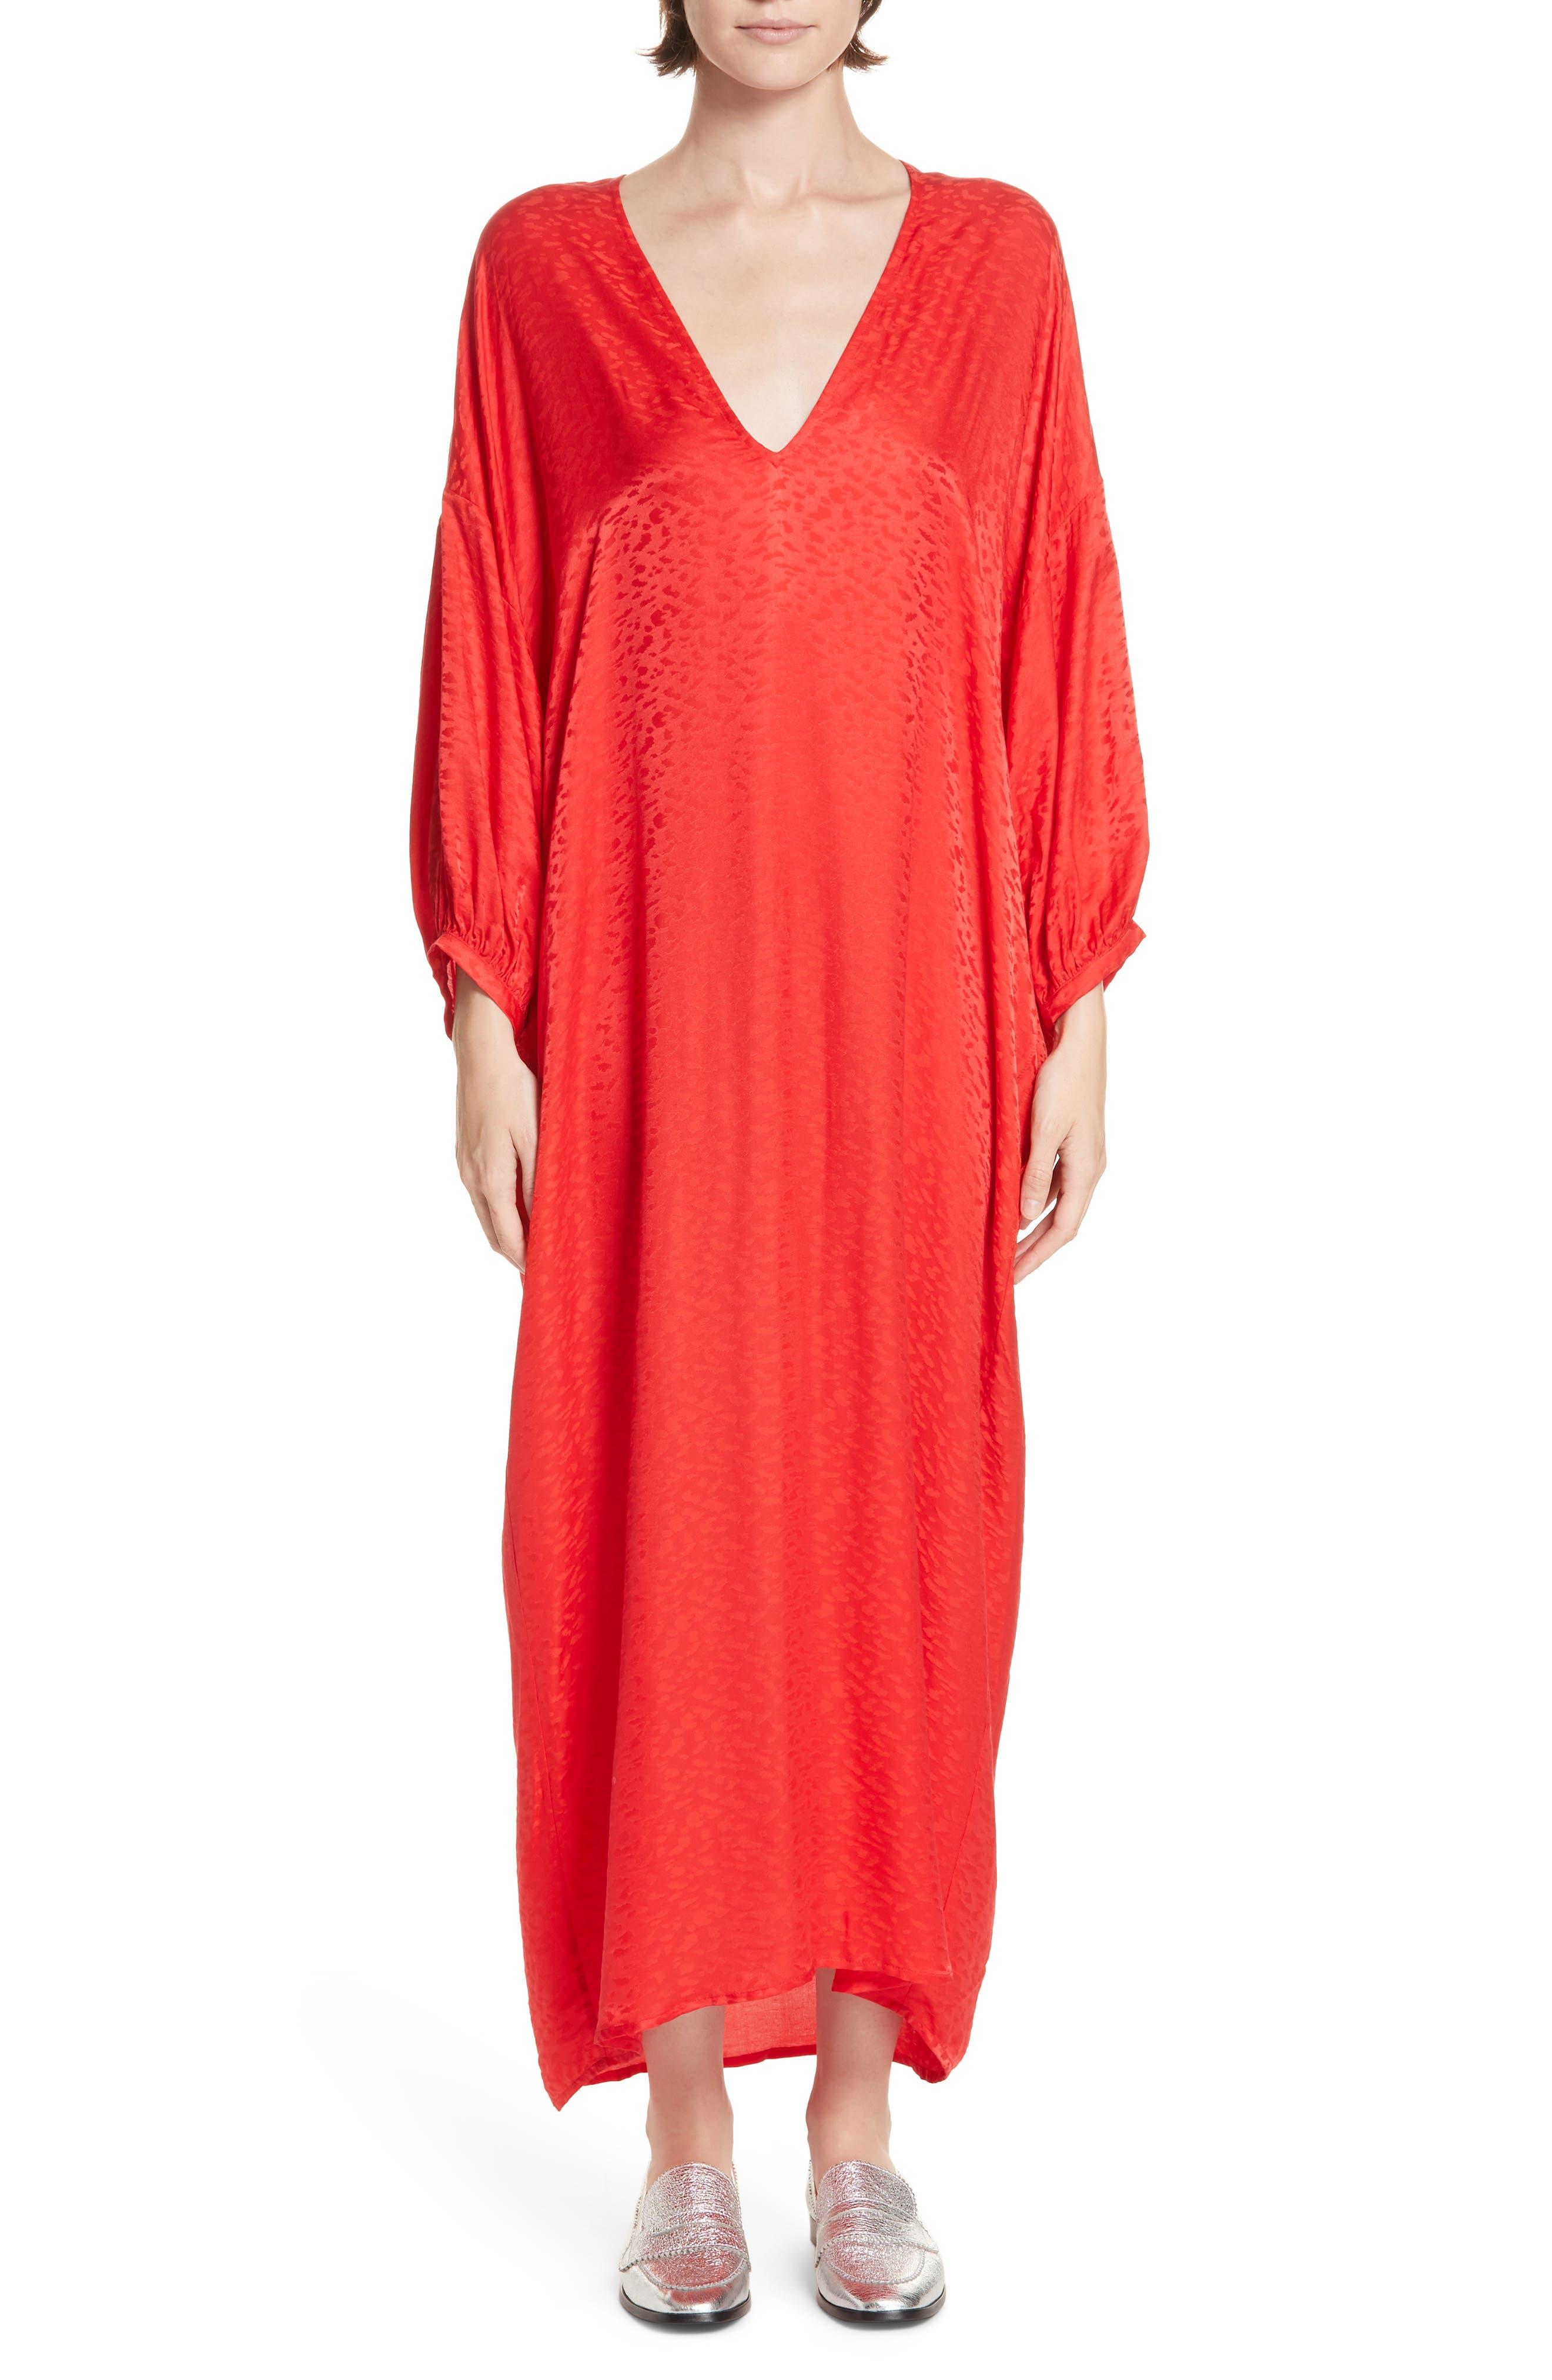 Roseanna Season Jacquard Maxi Dress, 4 FR - Red